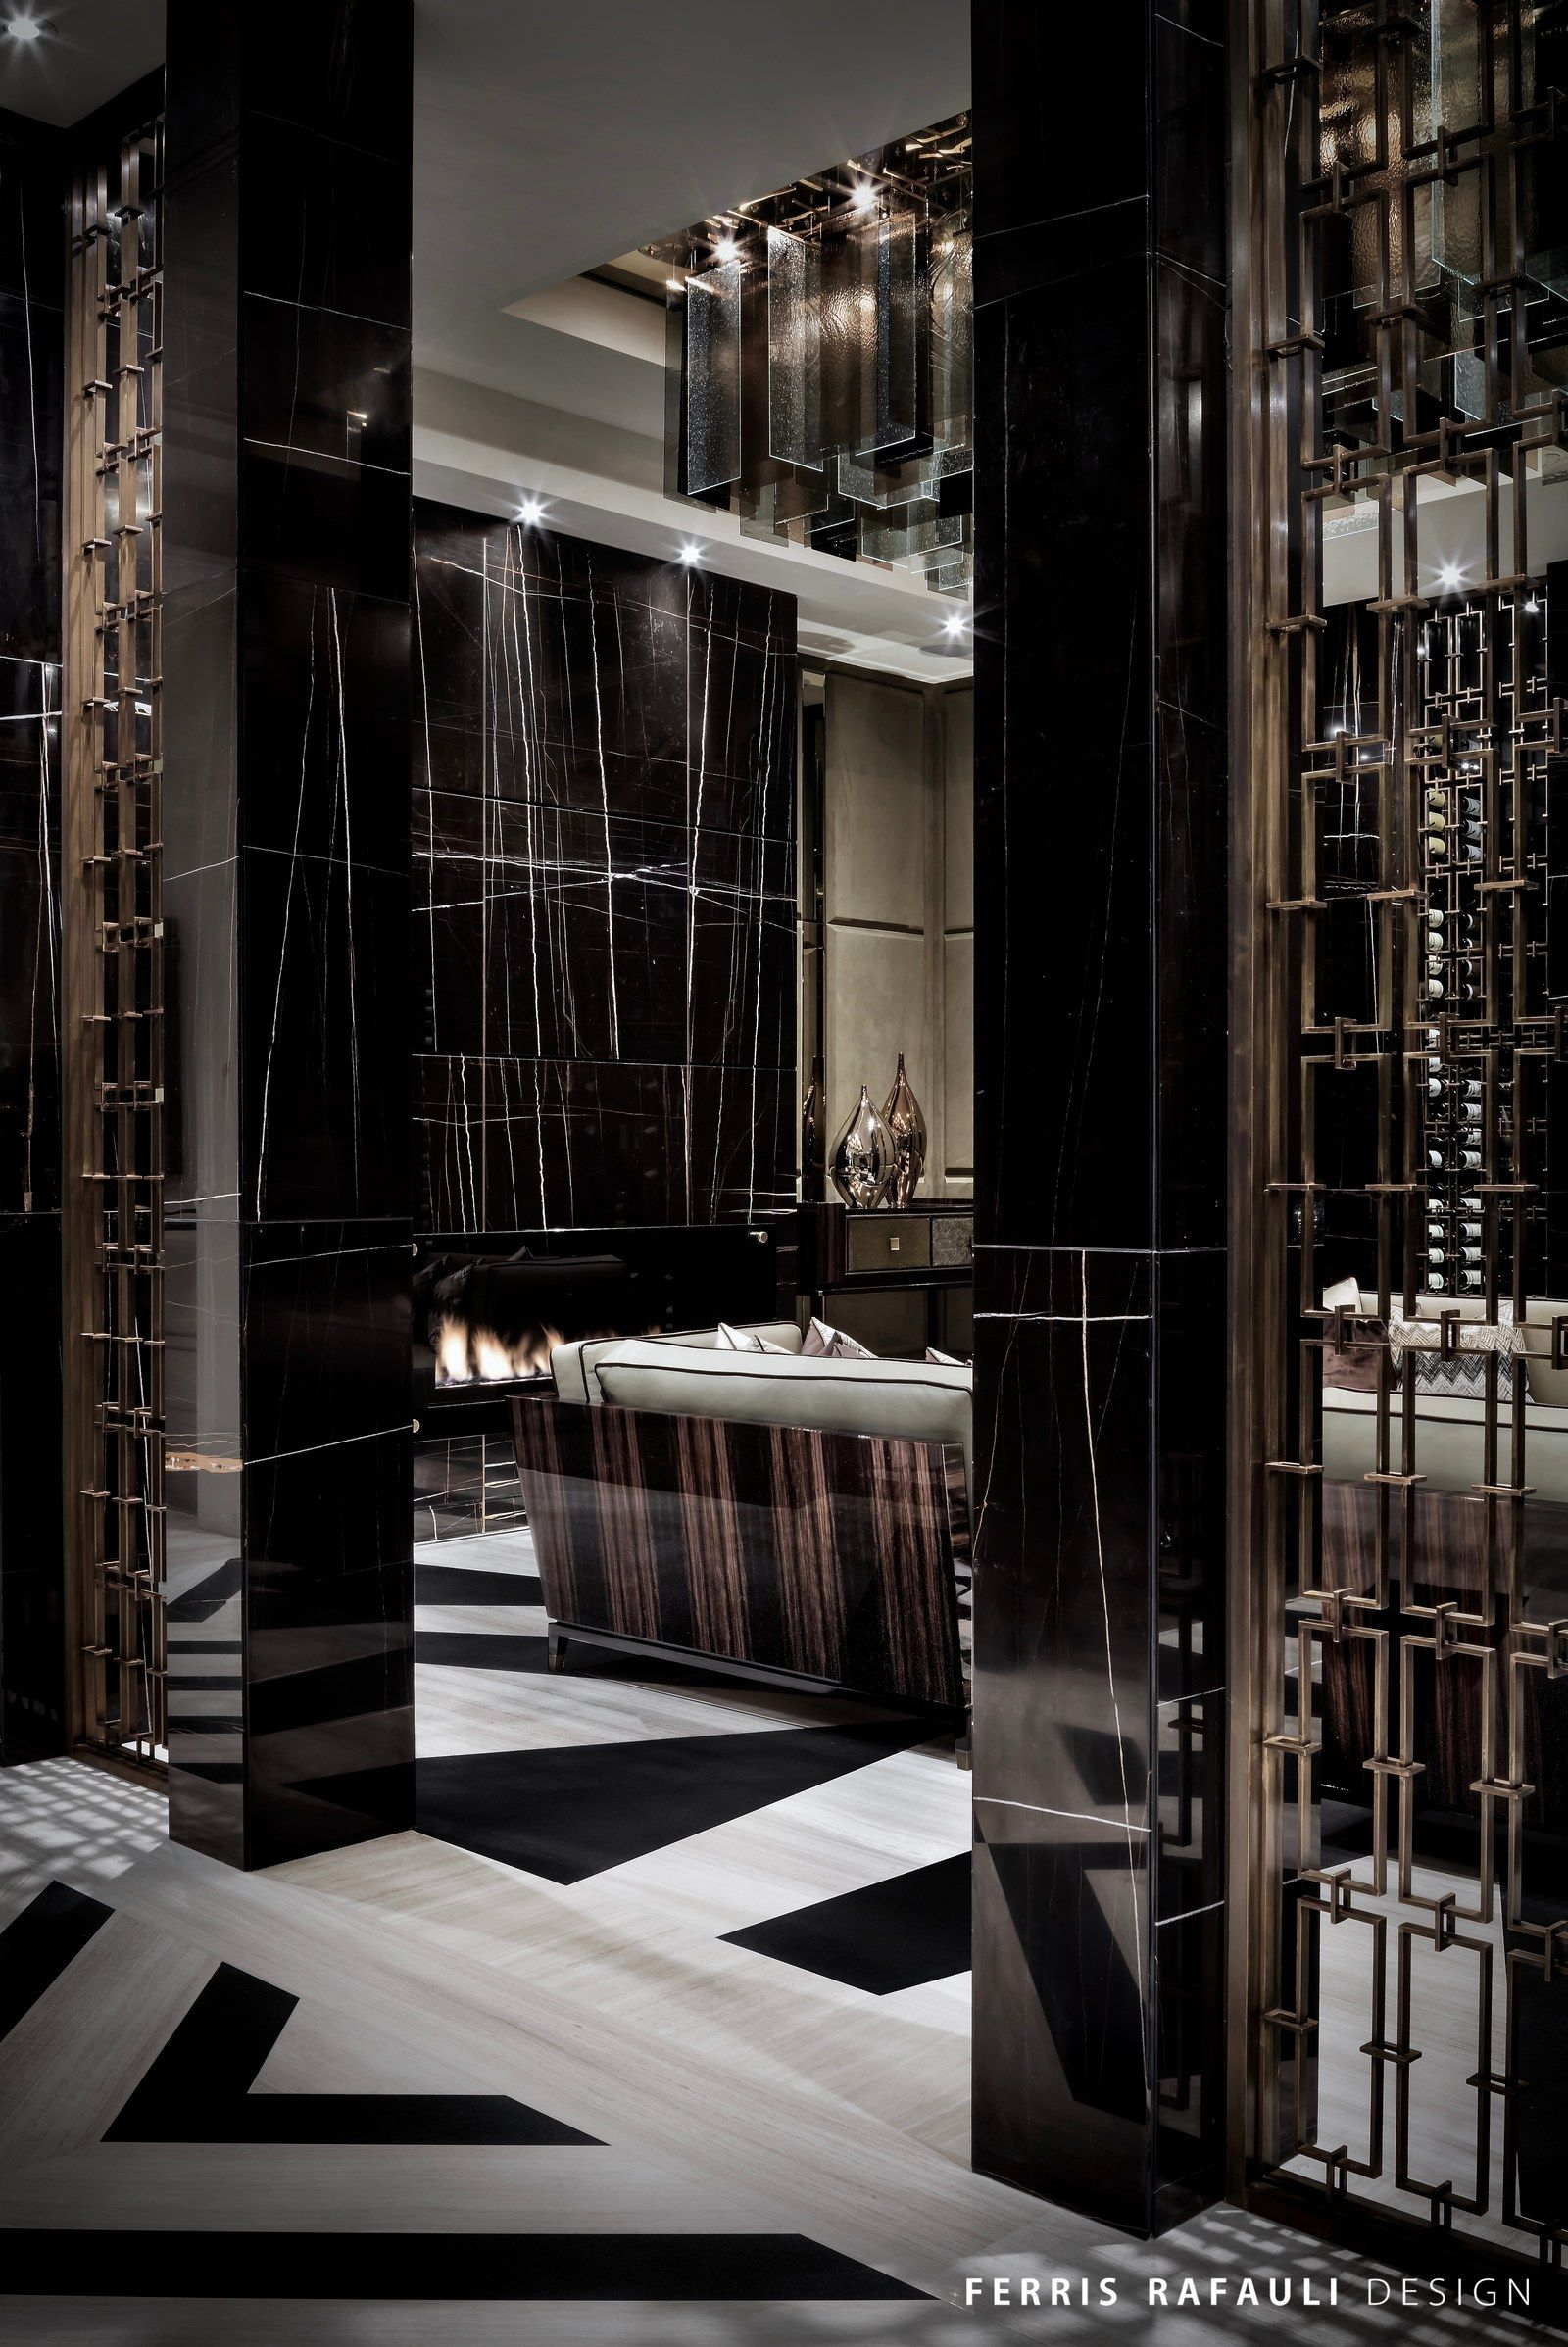 Luxury Showcase For Living Room Royal Art Deco: Architecture By Ferris Rafauli